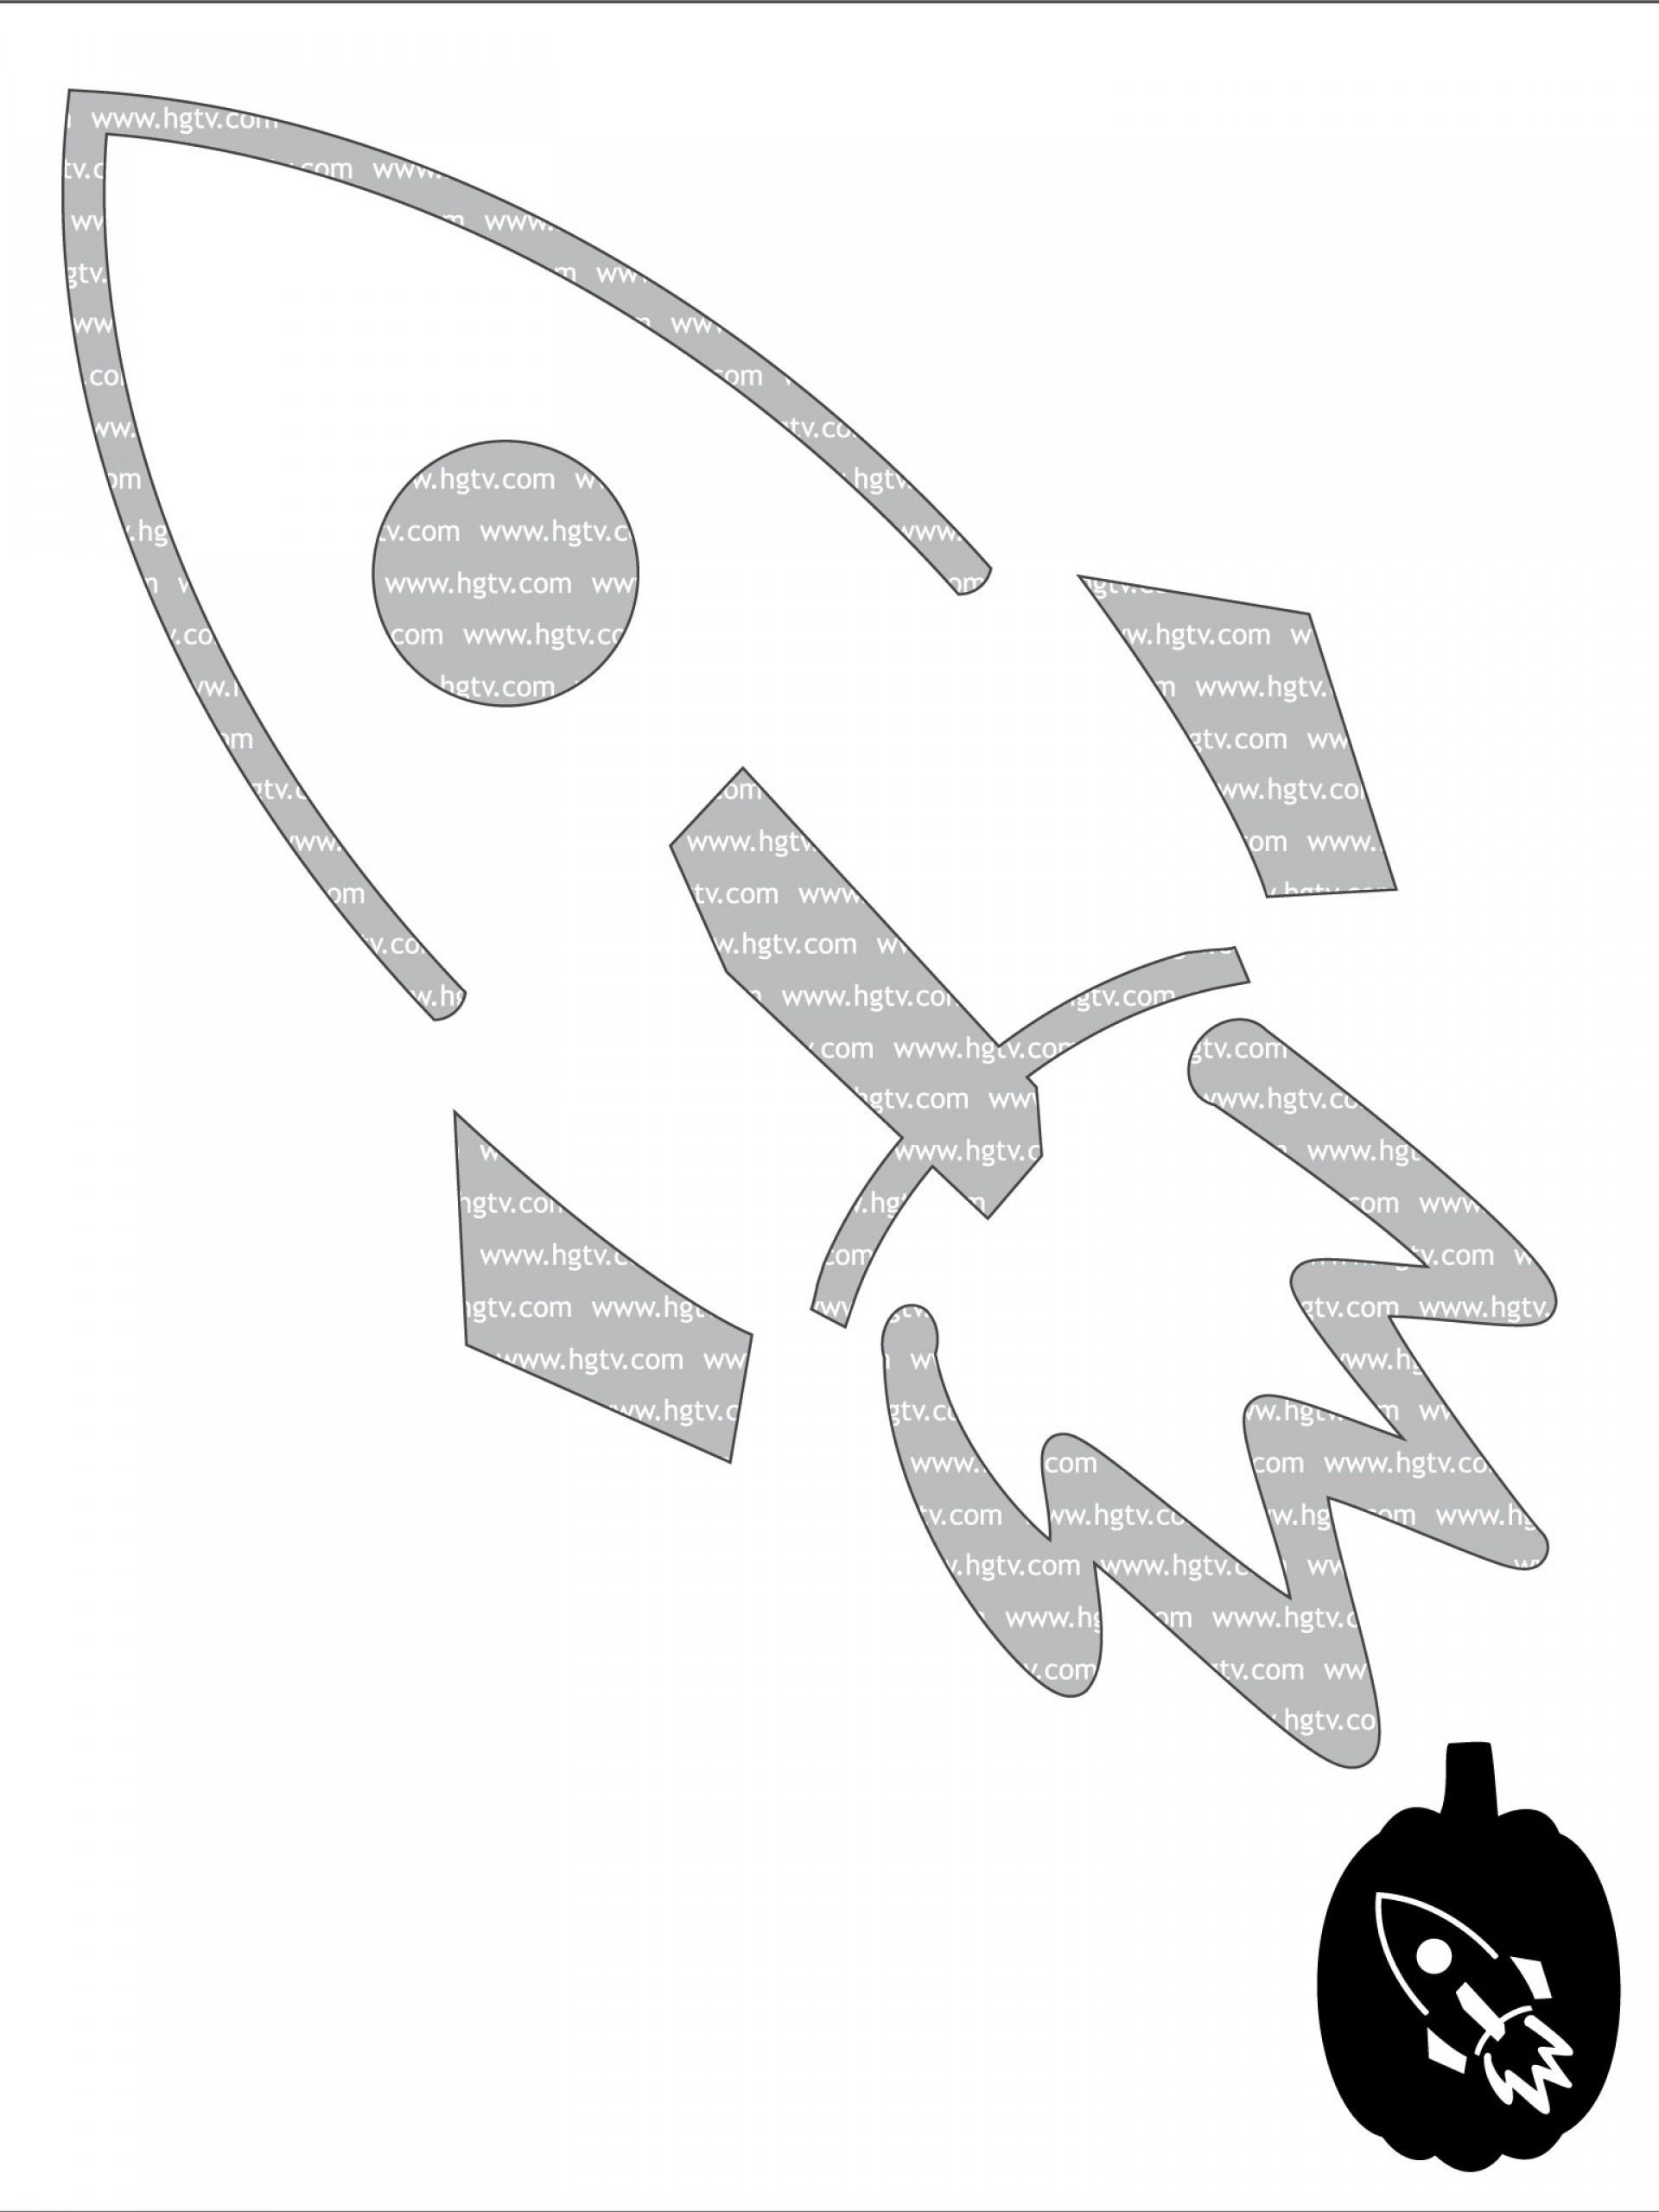 025 Template Ideas Free Pumpkin Templates Printable Original Sam - Printable Nfl Pumpkin Carving Patterns Free